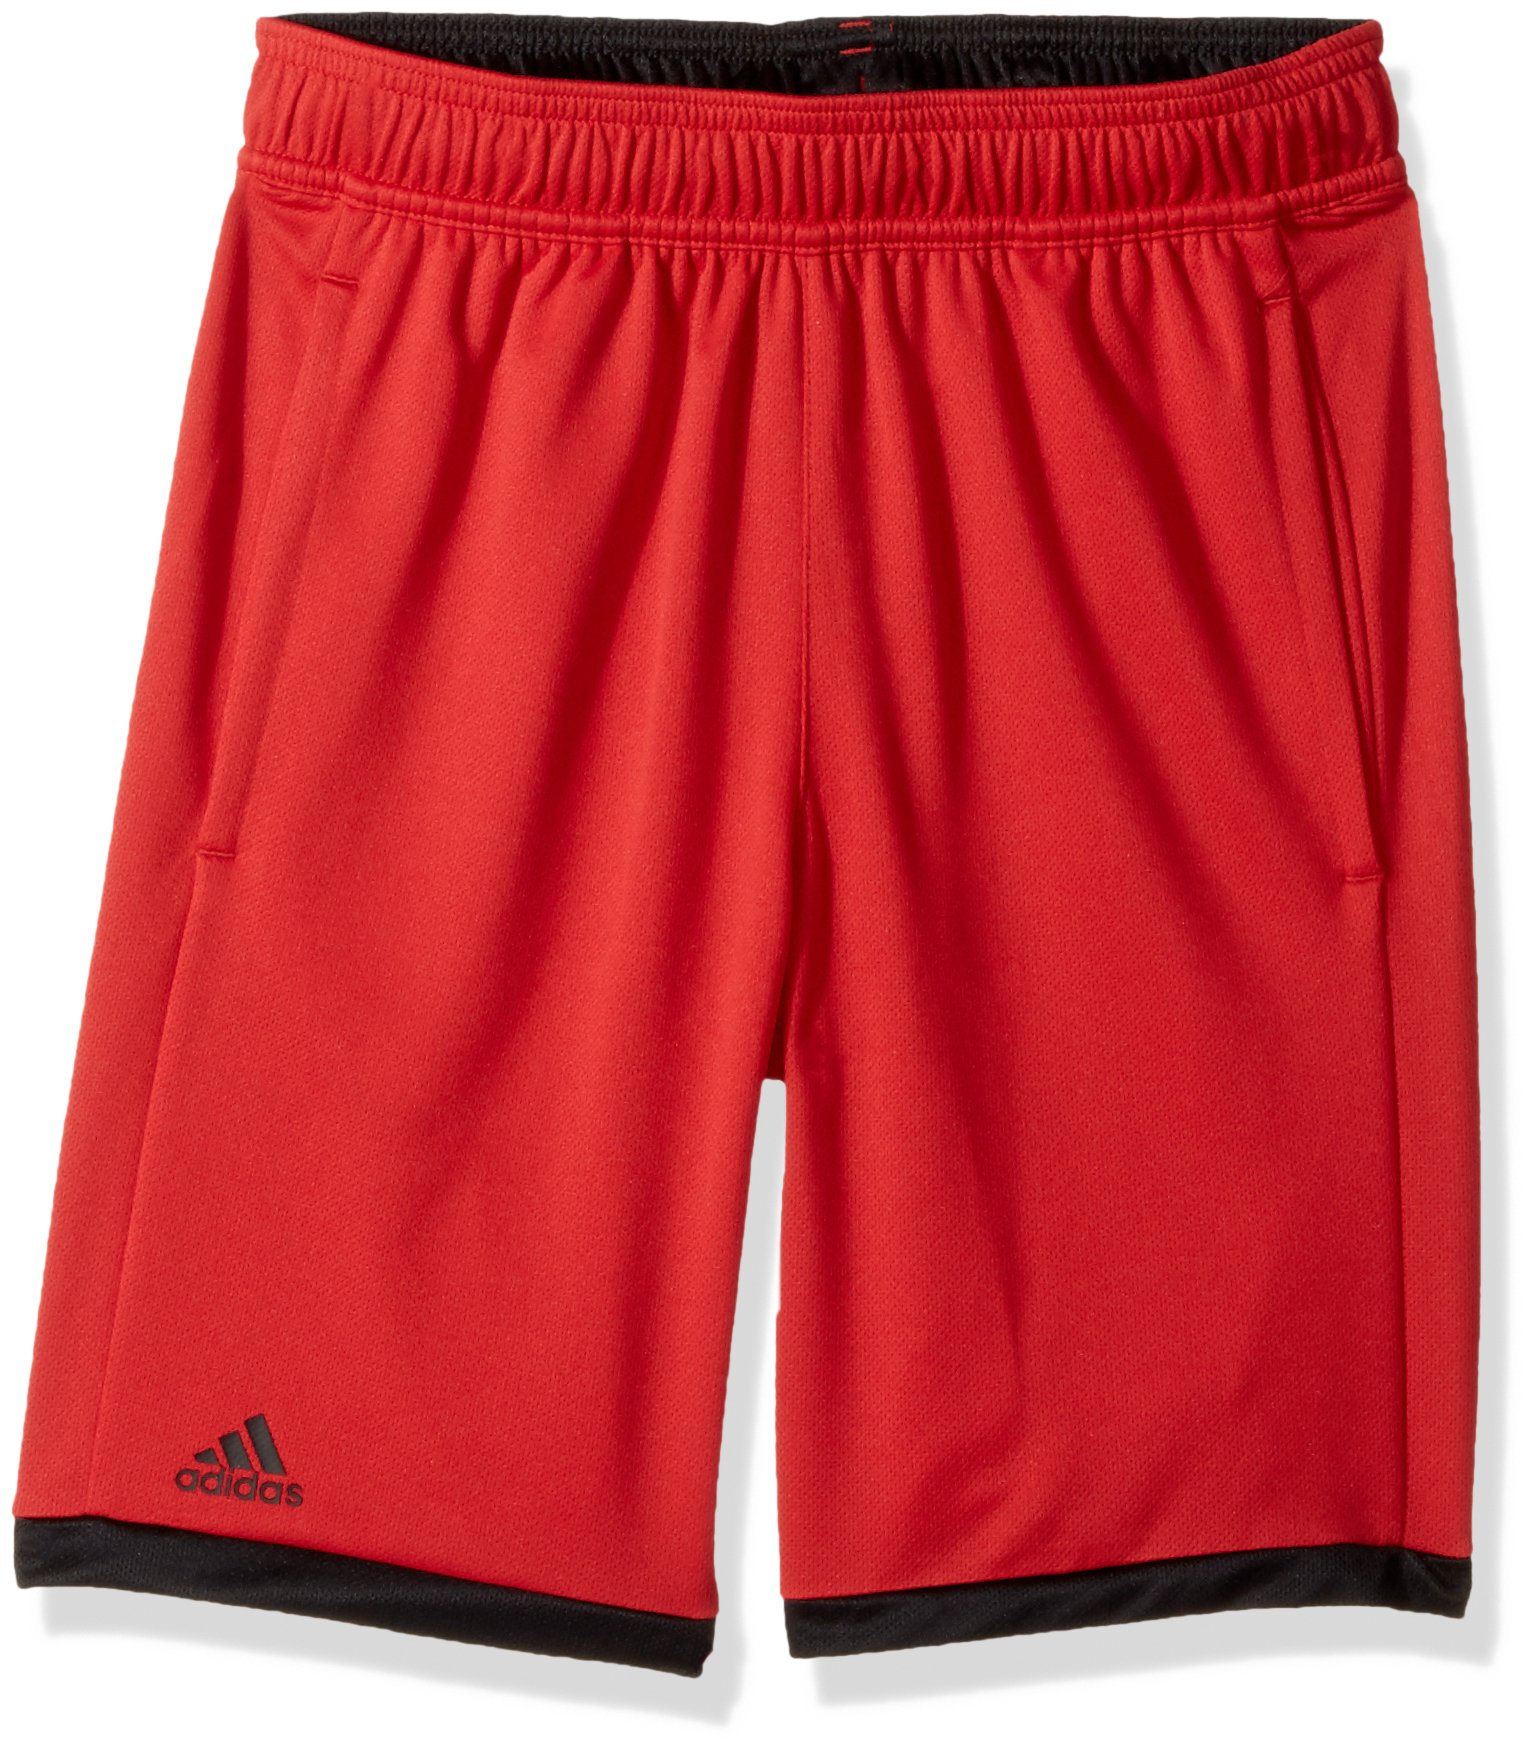 adidas Youth Boys Tennis Court Shorts, Scarlet/Black, X-Small